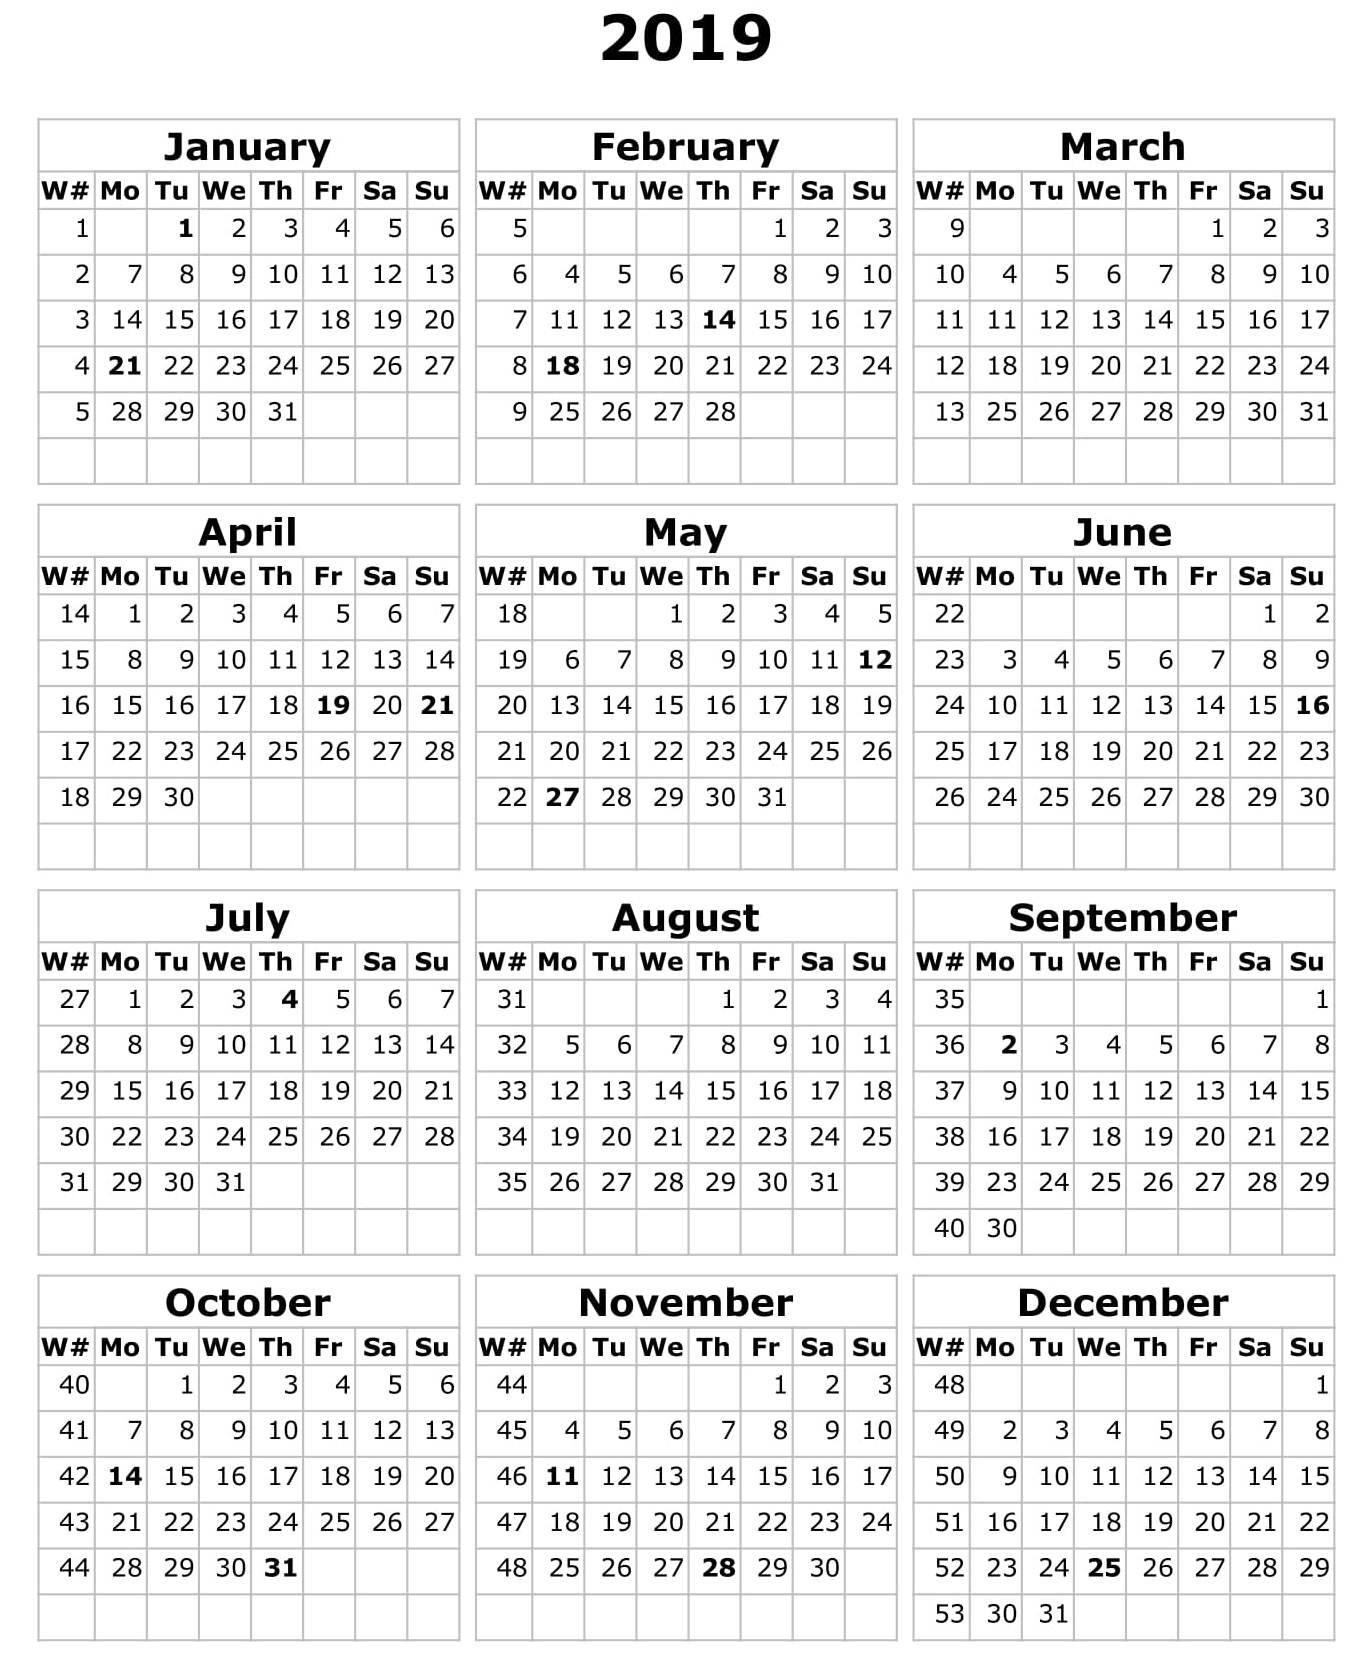 Calendar 2019 Microsoft Word – Free Calendar Templates & Worksheets Calendar 2019 Microsoft